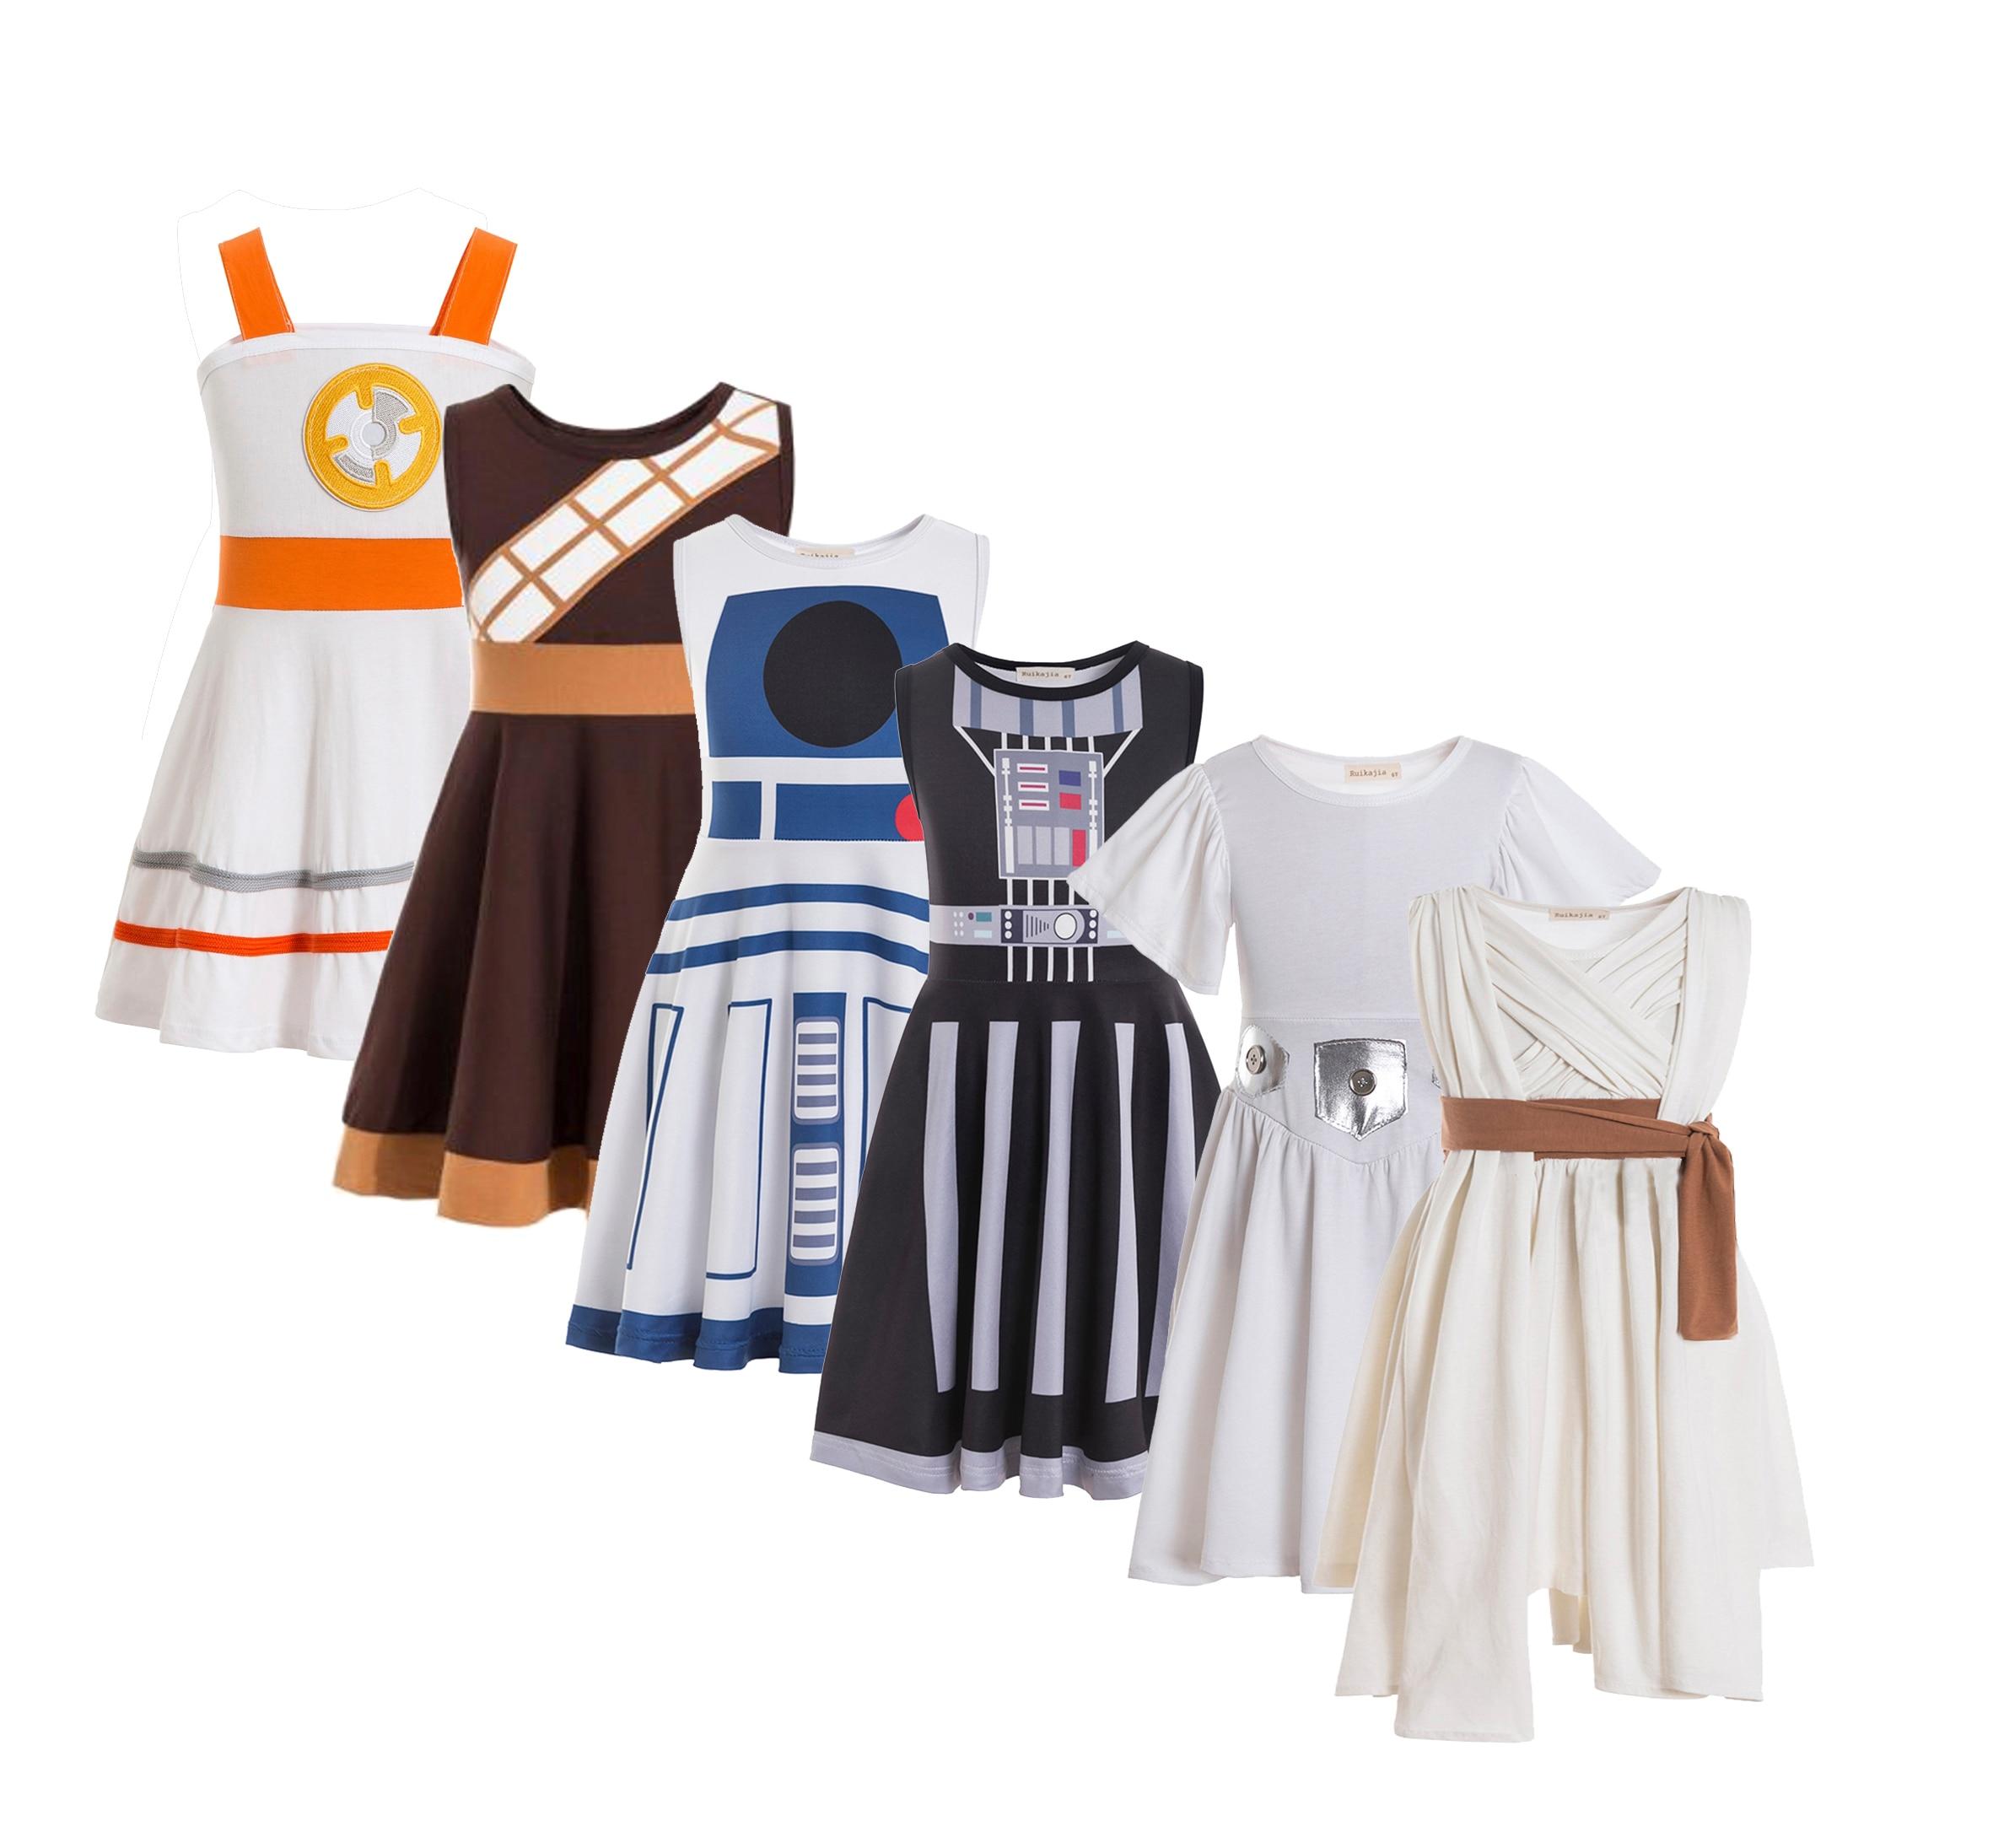 Princess Leia costume, leia outfit,Girls dress,Twirl dress,Halloween Costumes,leia Birthday Outfit,Toddler Dress 3